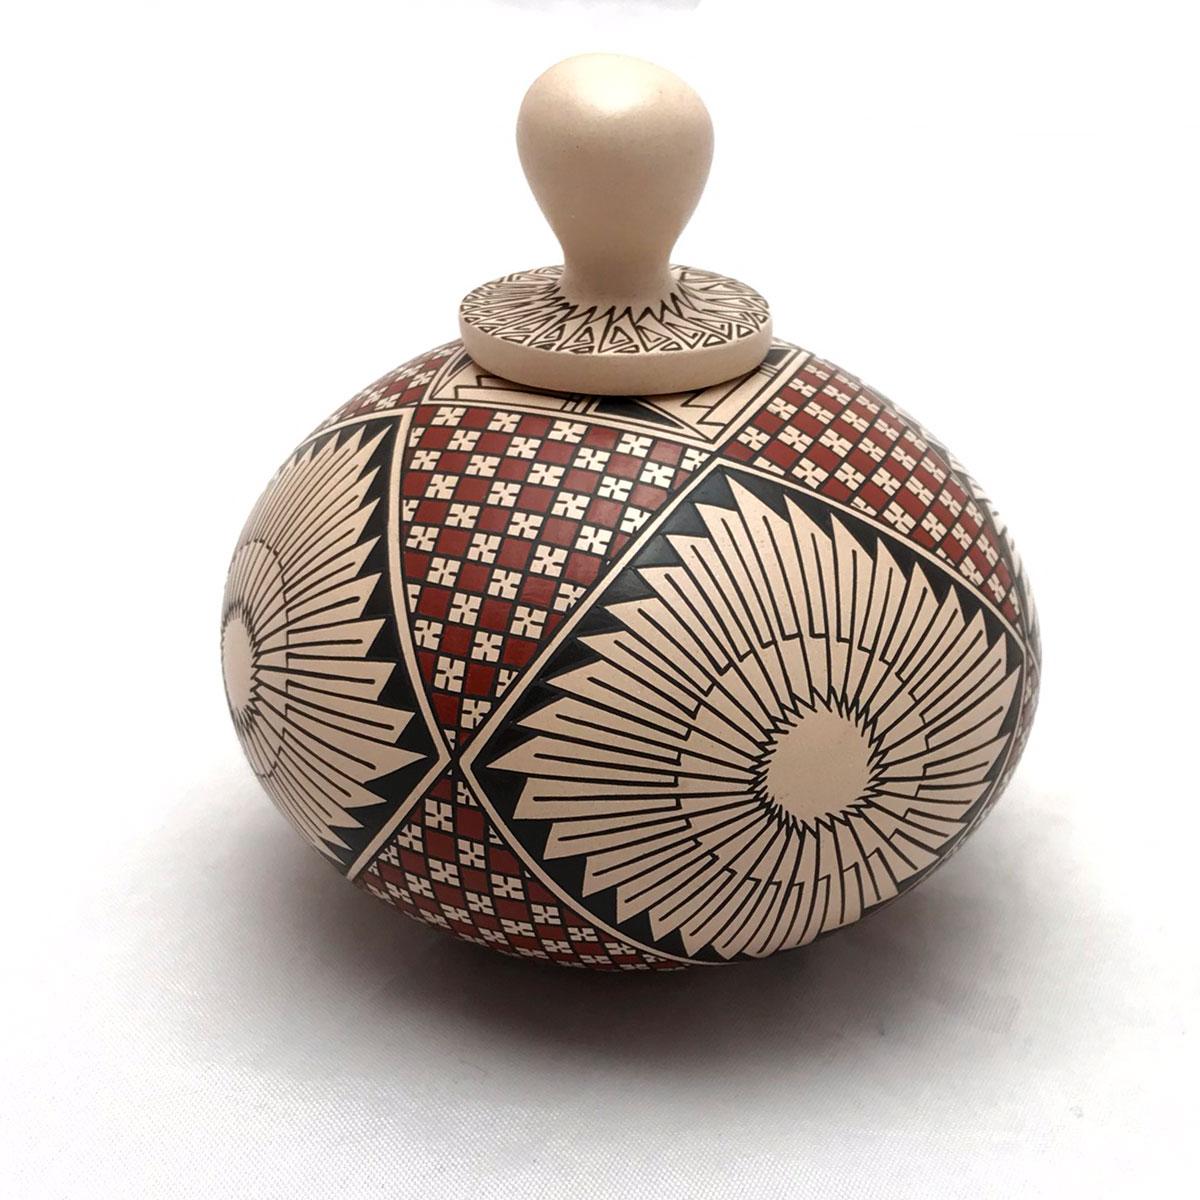 Blanca Quezada Blanca Quezada: Small Geometric Feather Pot with Top Geometric